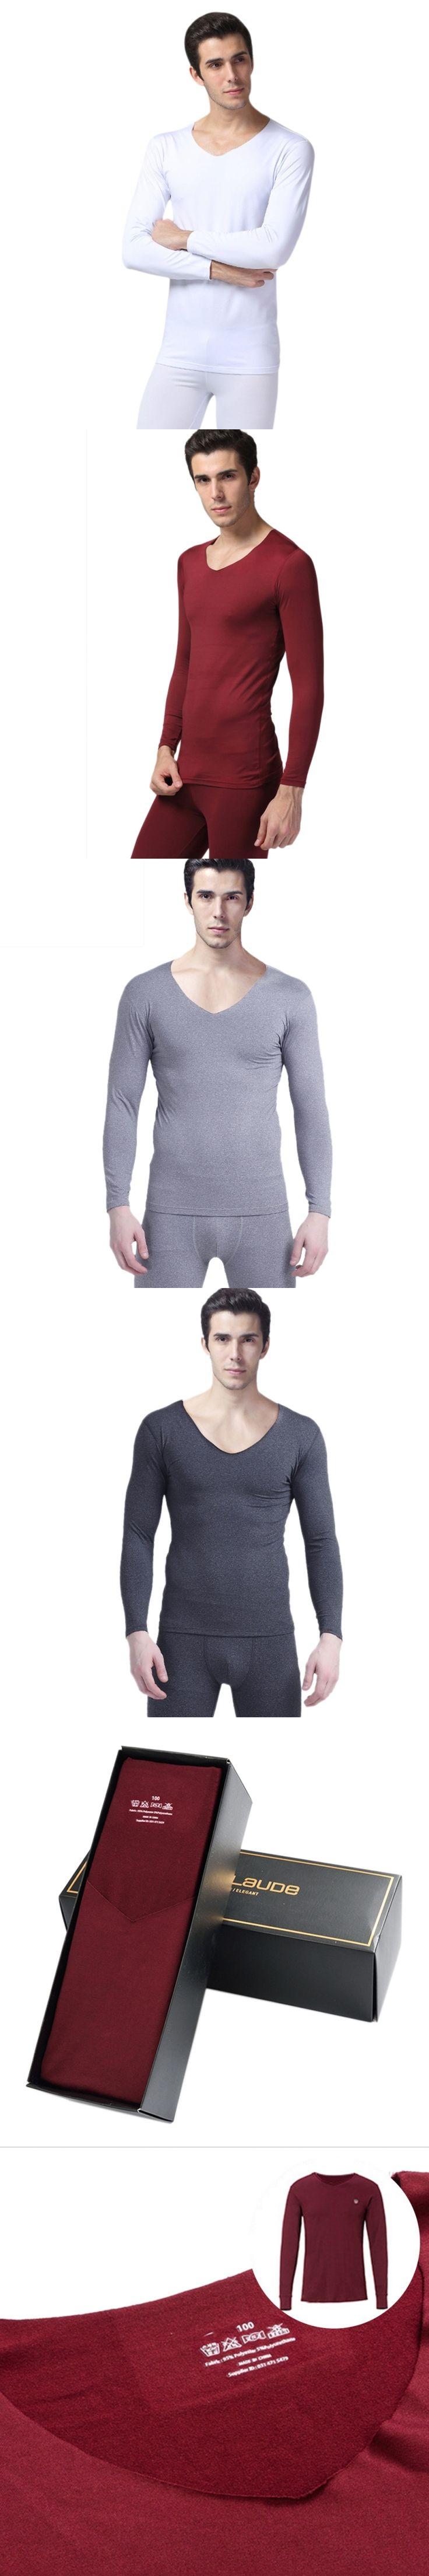 Warm Men 2Pcs Thermal Pajamas Winter Underwear Set Thicken Long Tops Bottom Navy Blue, Dark Gray, Light Gray plus size YRD